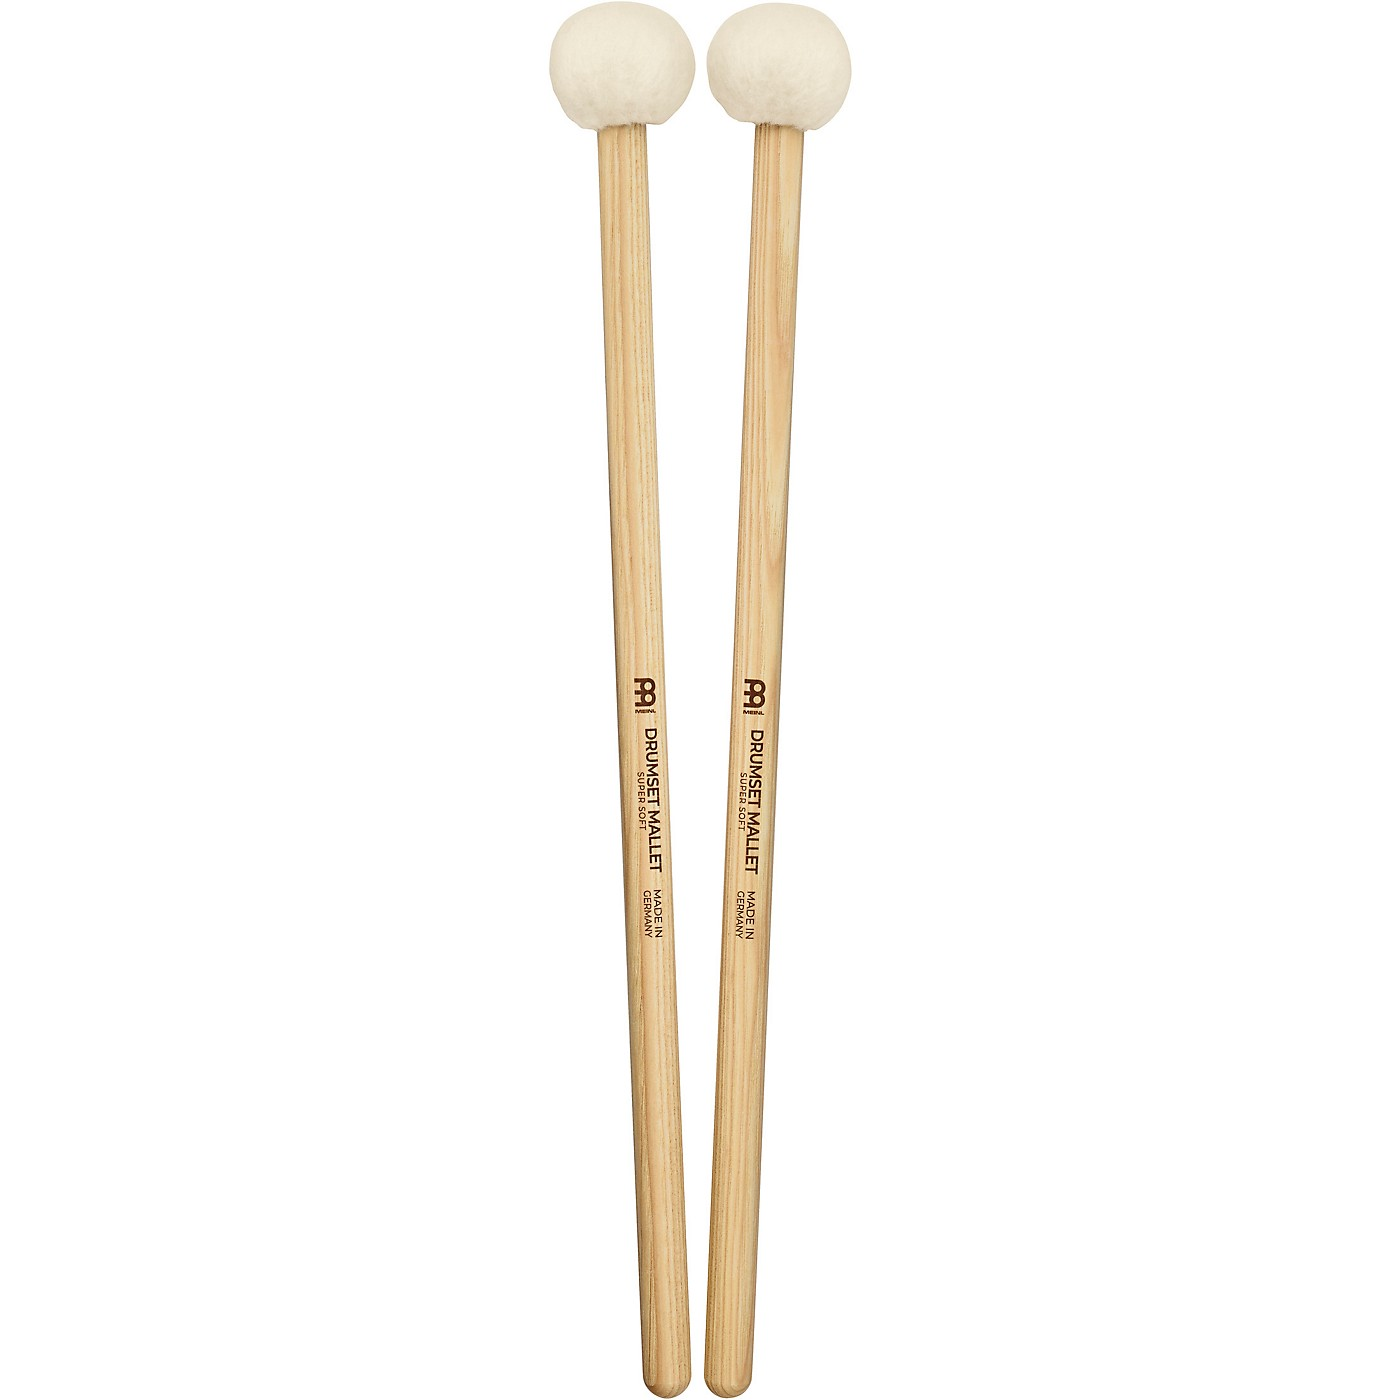 Meinl Stick & Brush Super Soft Mallets thumbnail